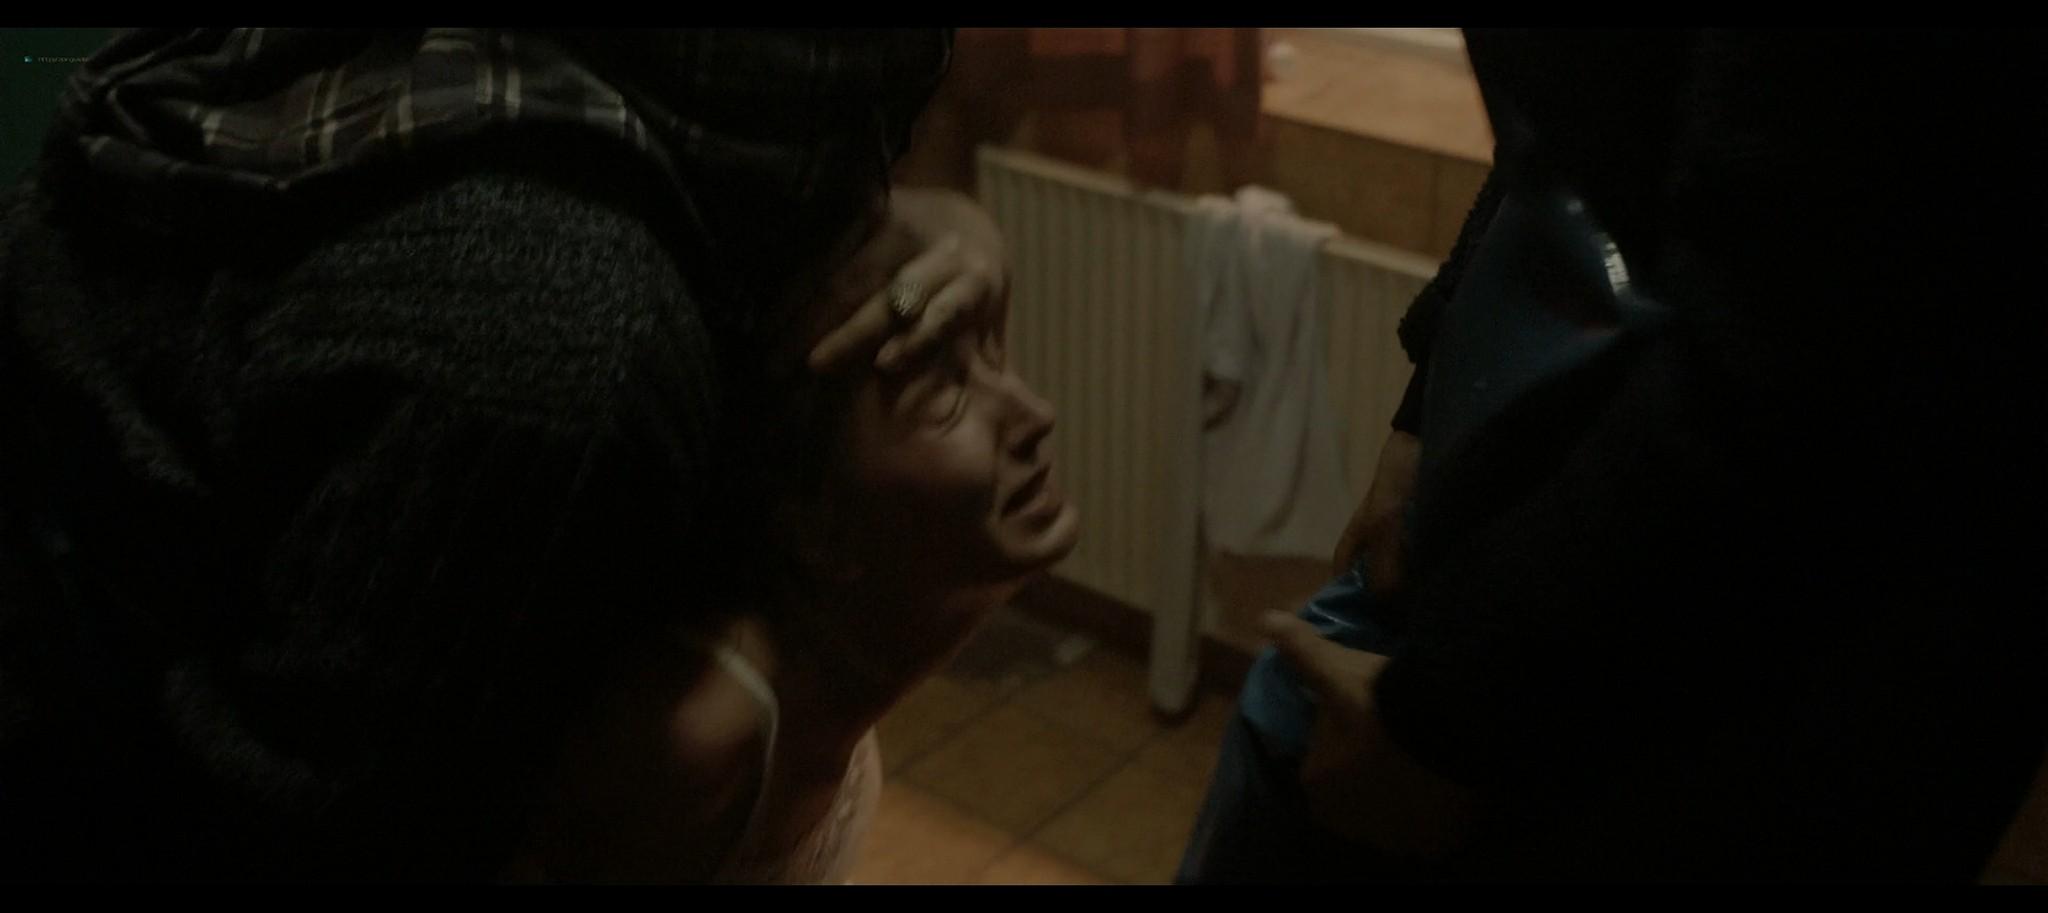 Sonia Suhl nude topless and some sex When Animals Dream DE DK 2014 HD 1080p BluRay 3